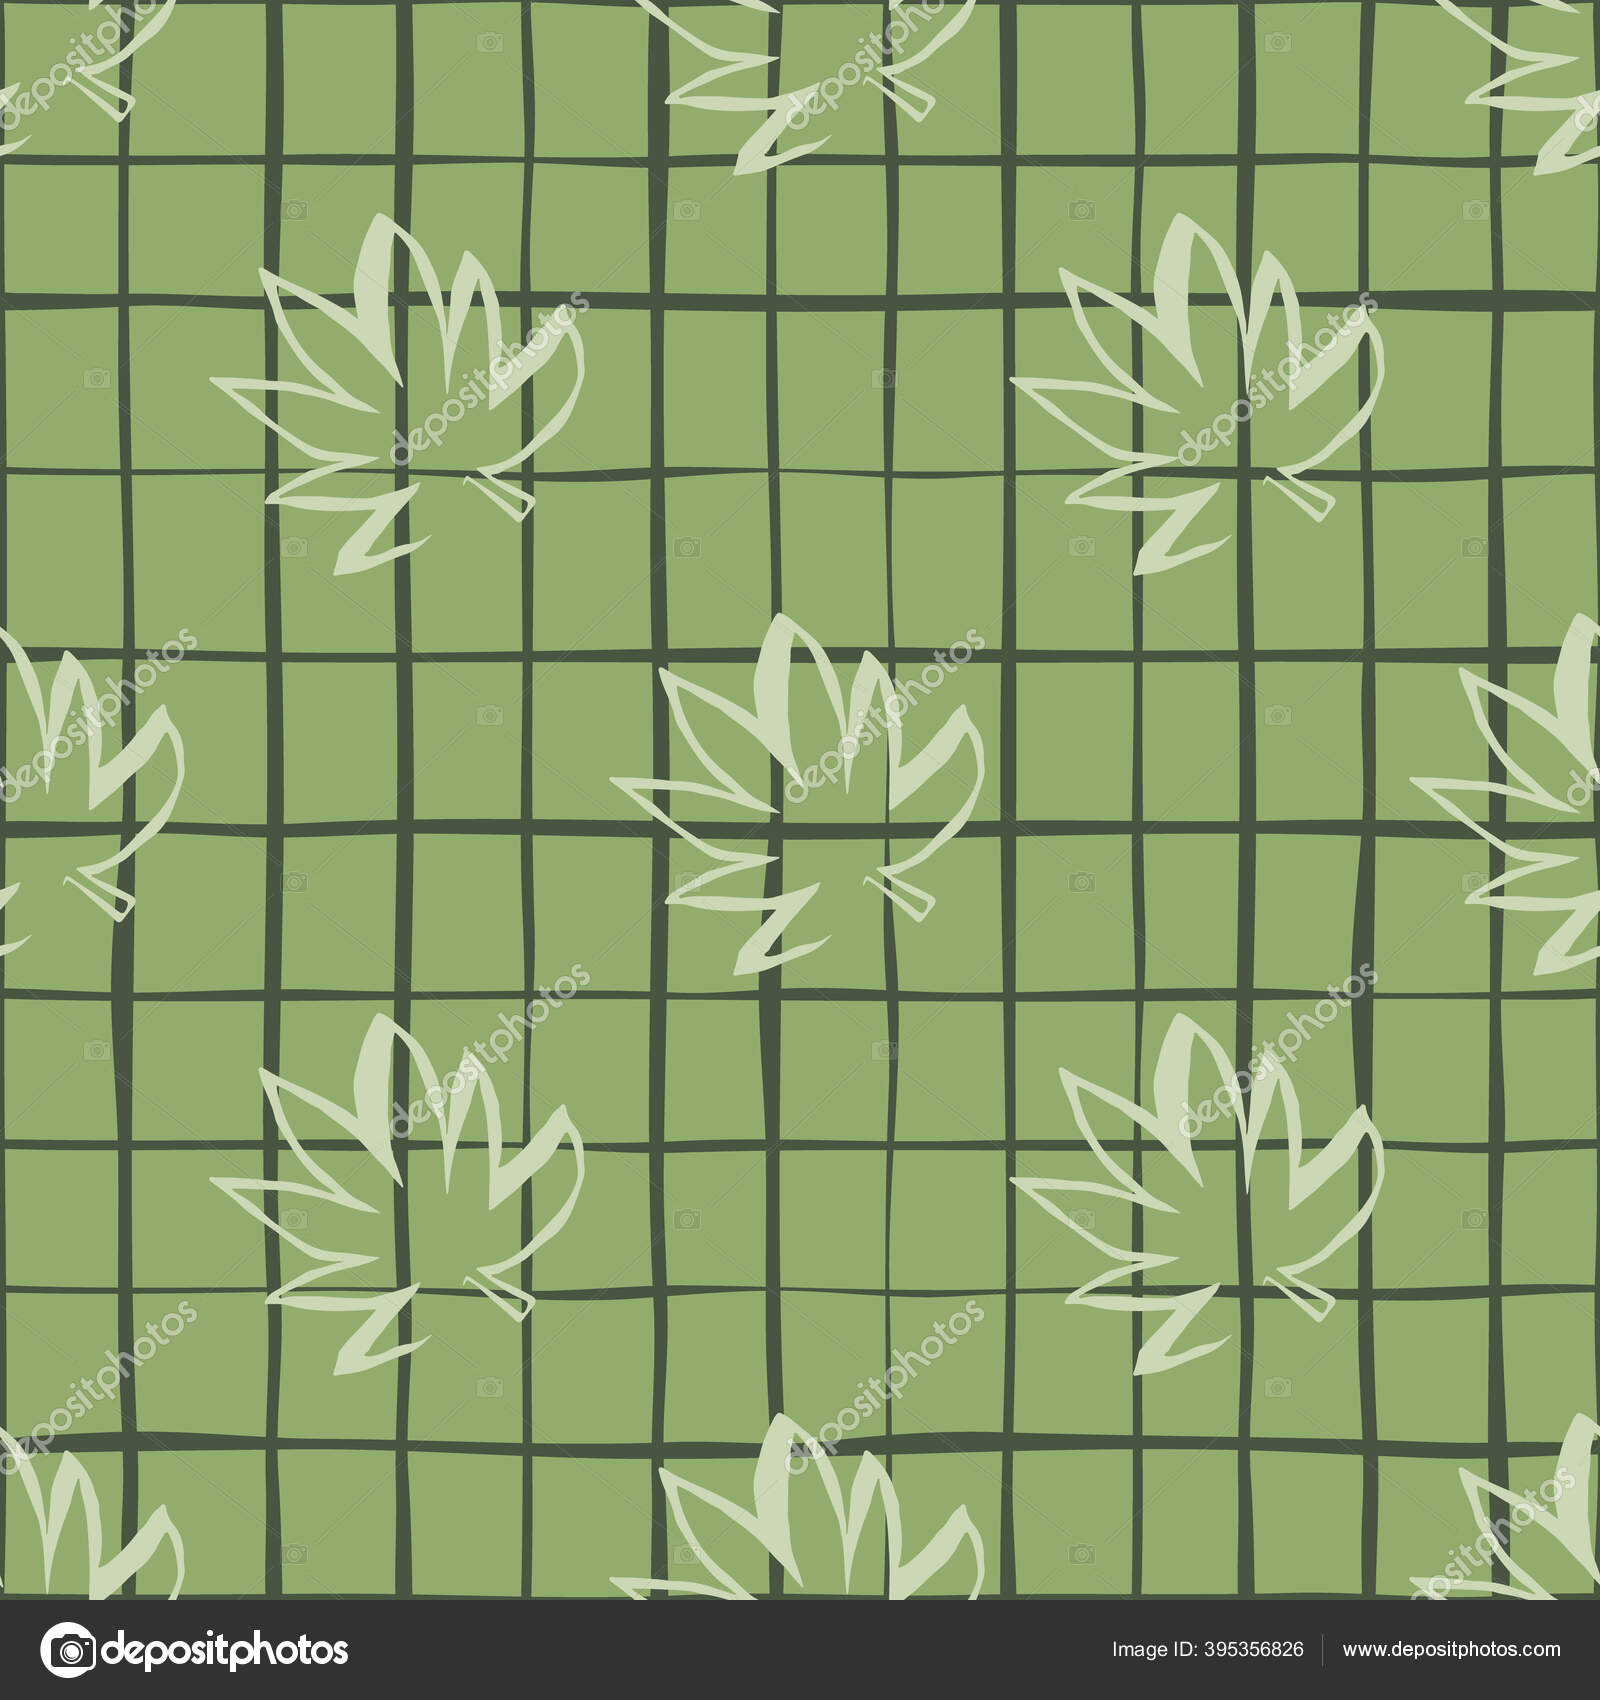 depositphotos 395356826 stock illustration seamless pattern white outline cannabis